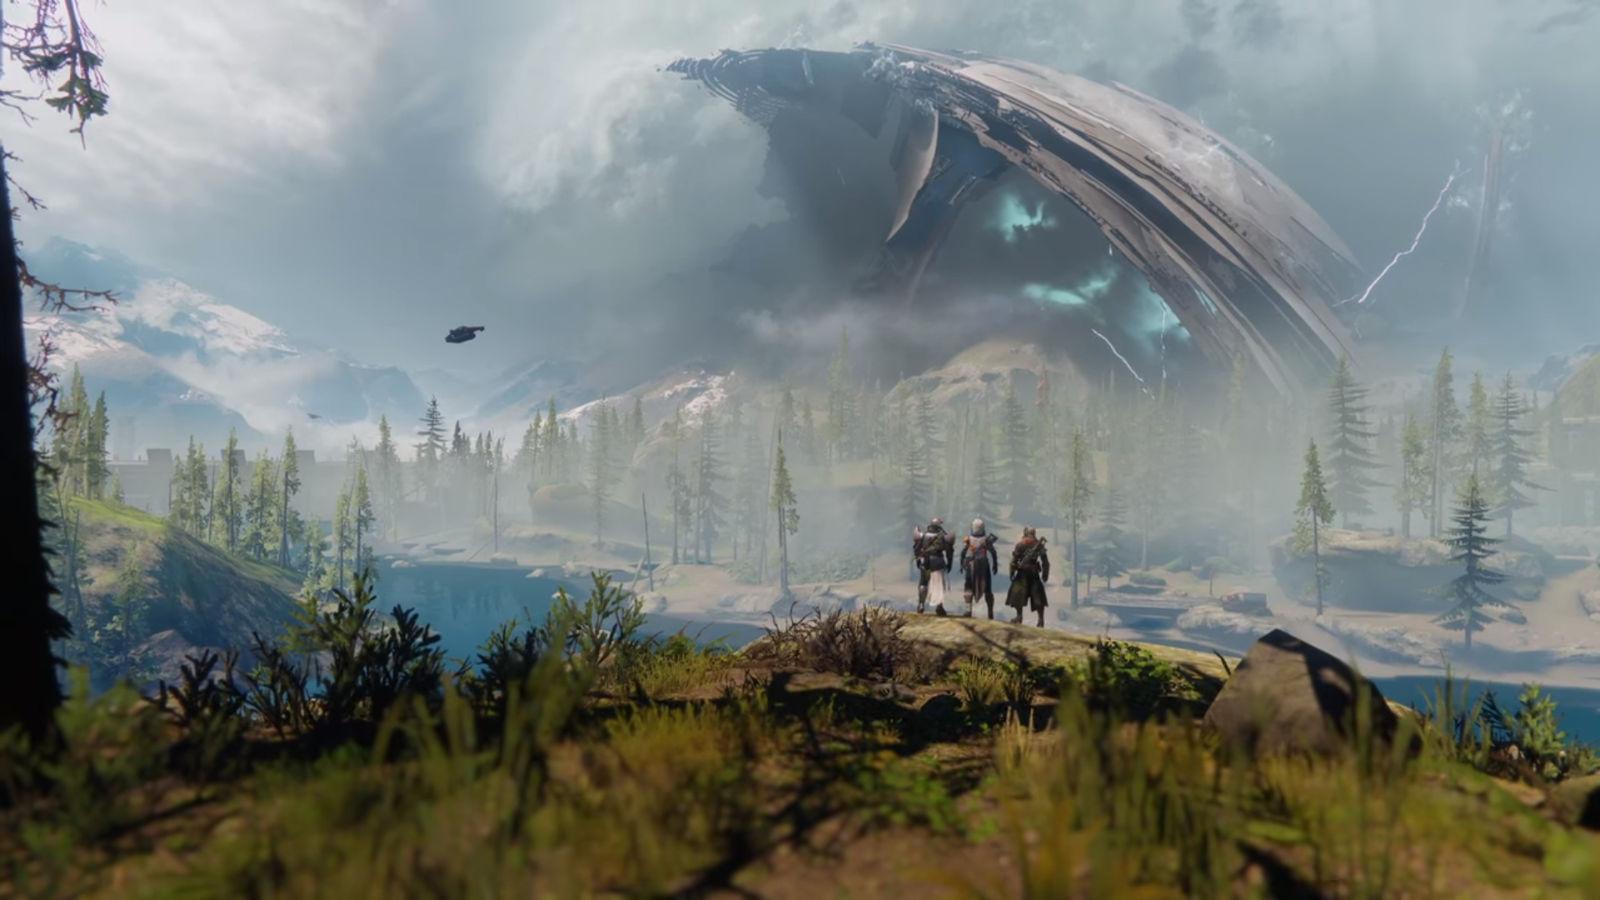 Destiny-2-Adieu-walkthrough-guide-How-to-kill-the-Legionary-the-War-Beasts-and-find-The-Farm